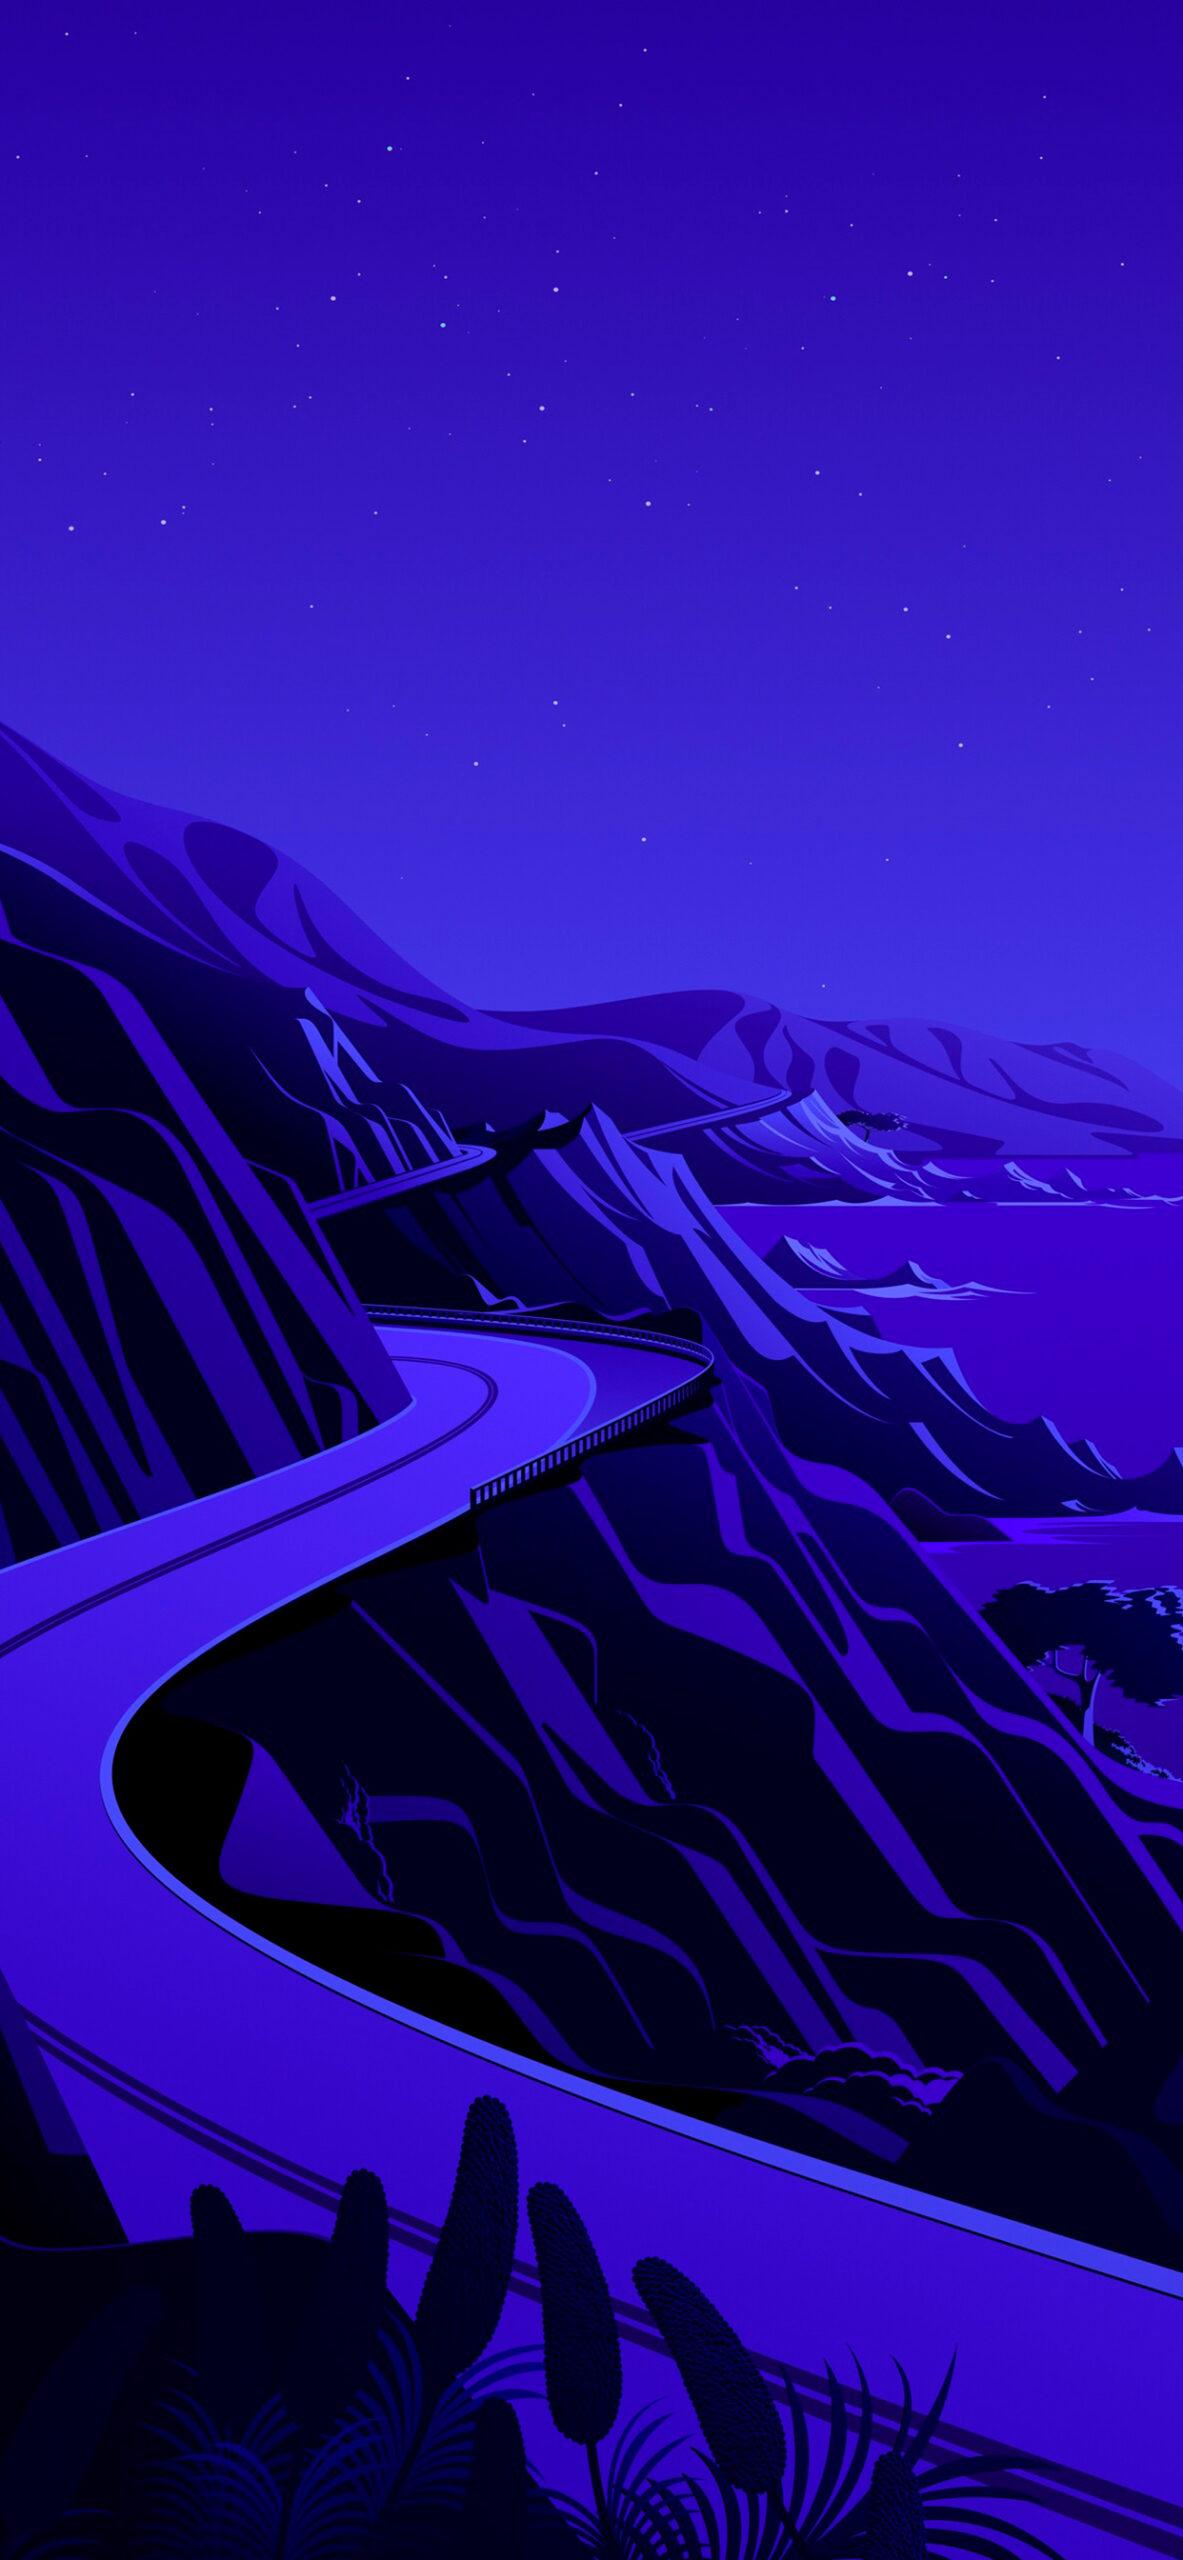 iphone wallpaper big sur cliffs7 scaled Mac OS Big Sur (Cliffs)